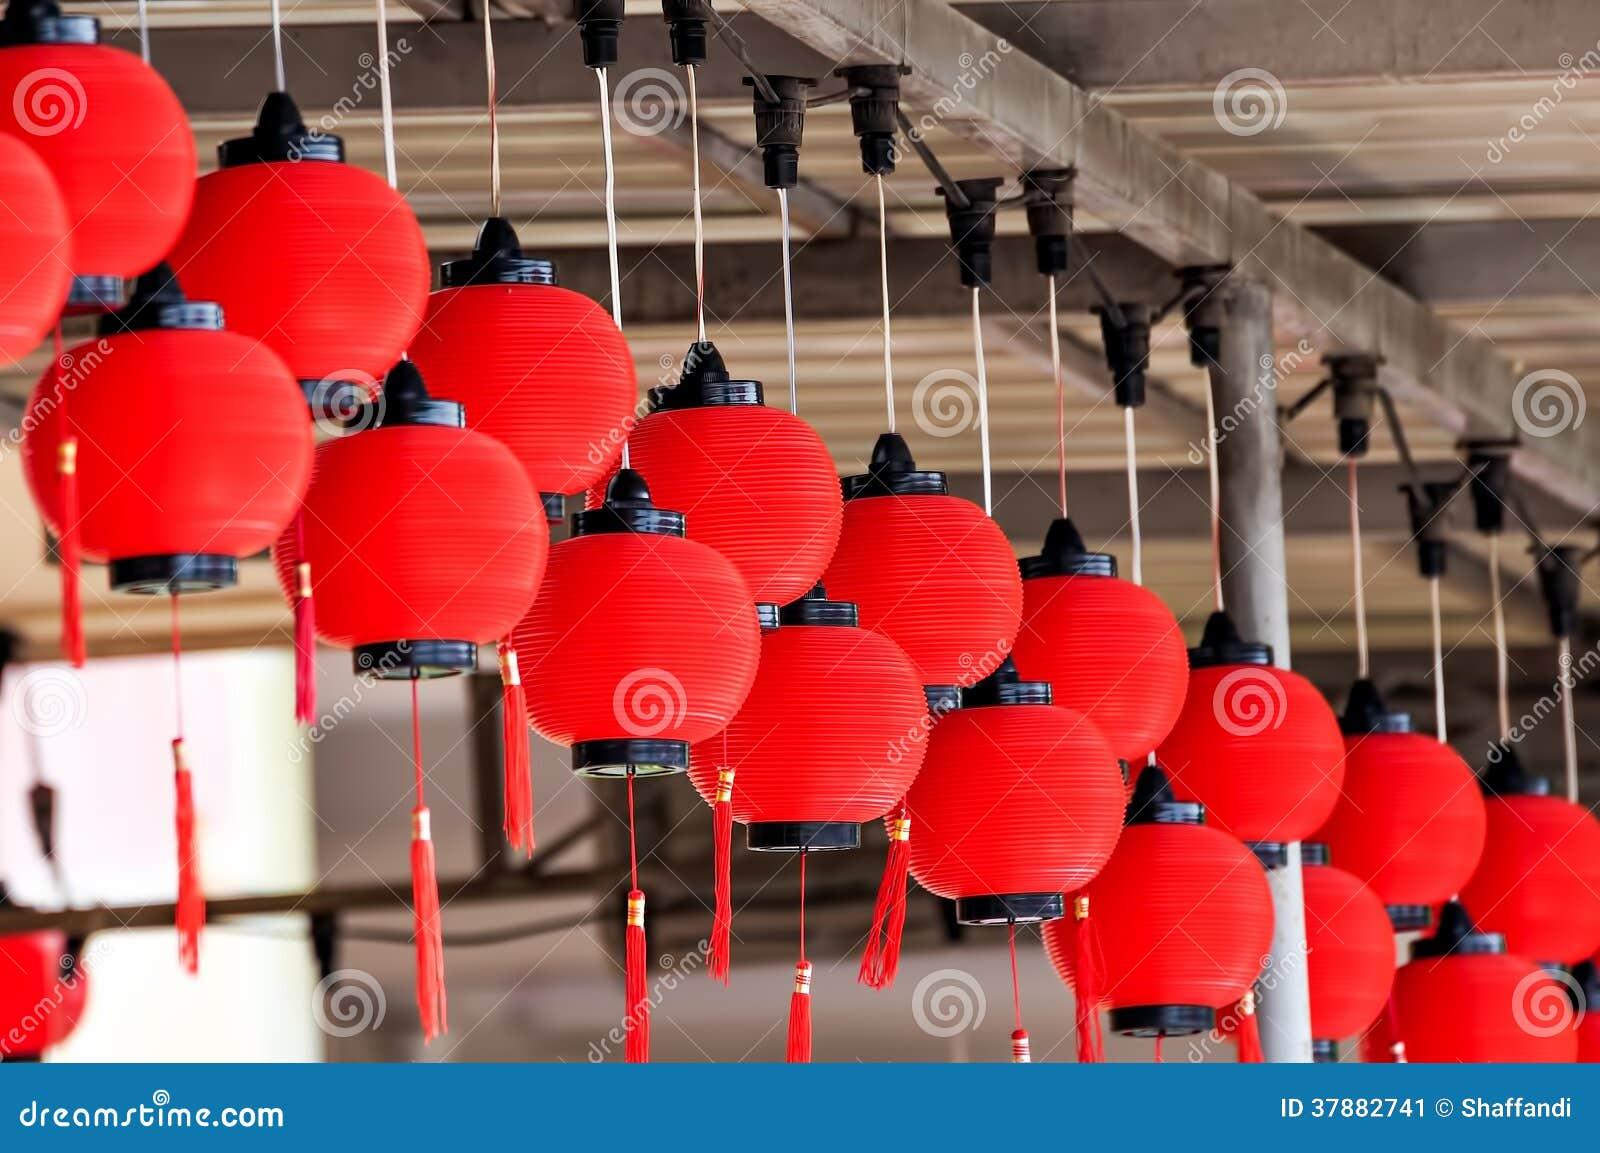 Rode lantaarns